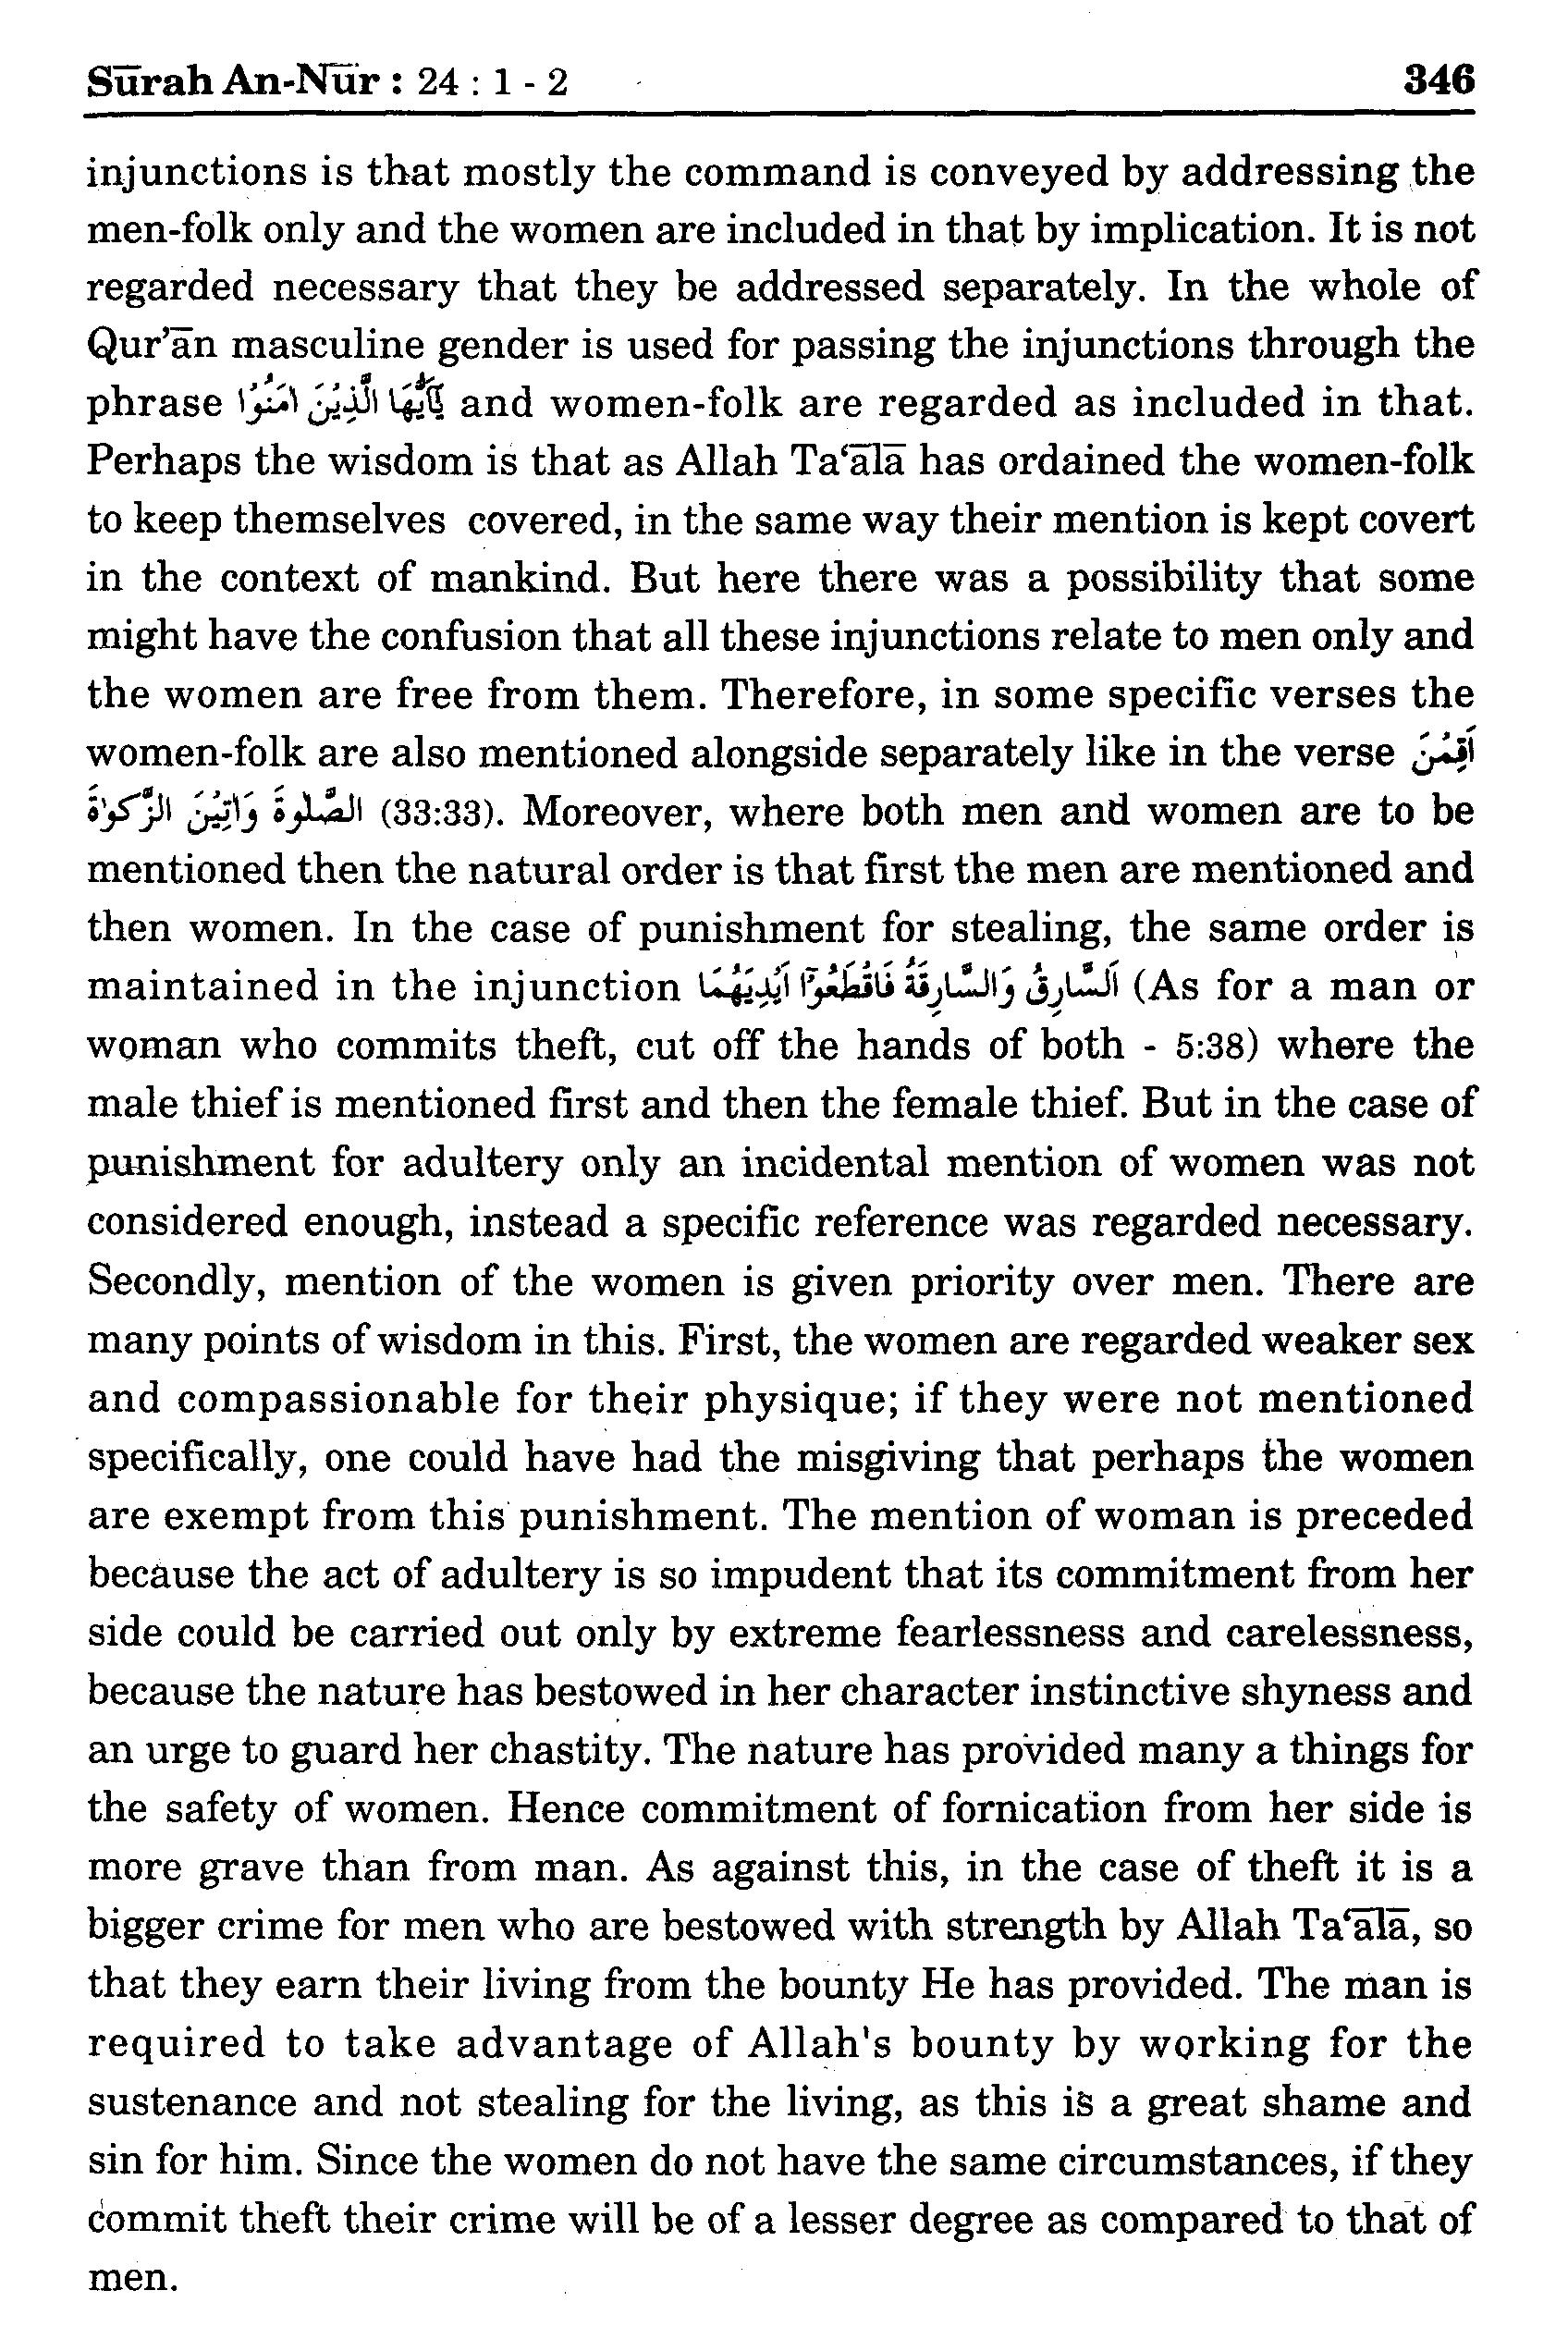 Surah An-Nur 24:1-2 - Maariful Quran - Maarif ul Quran